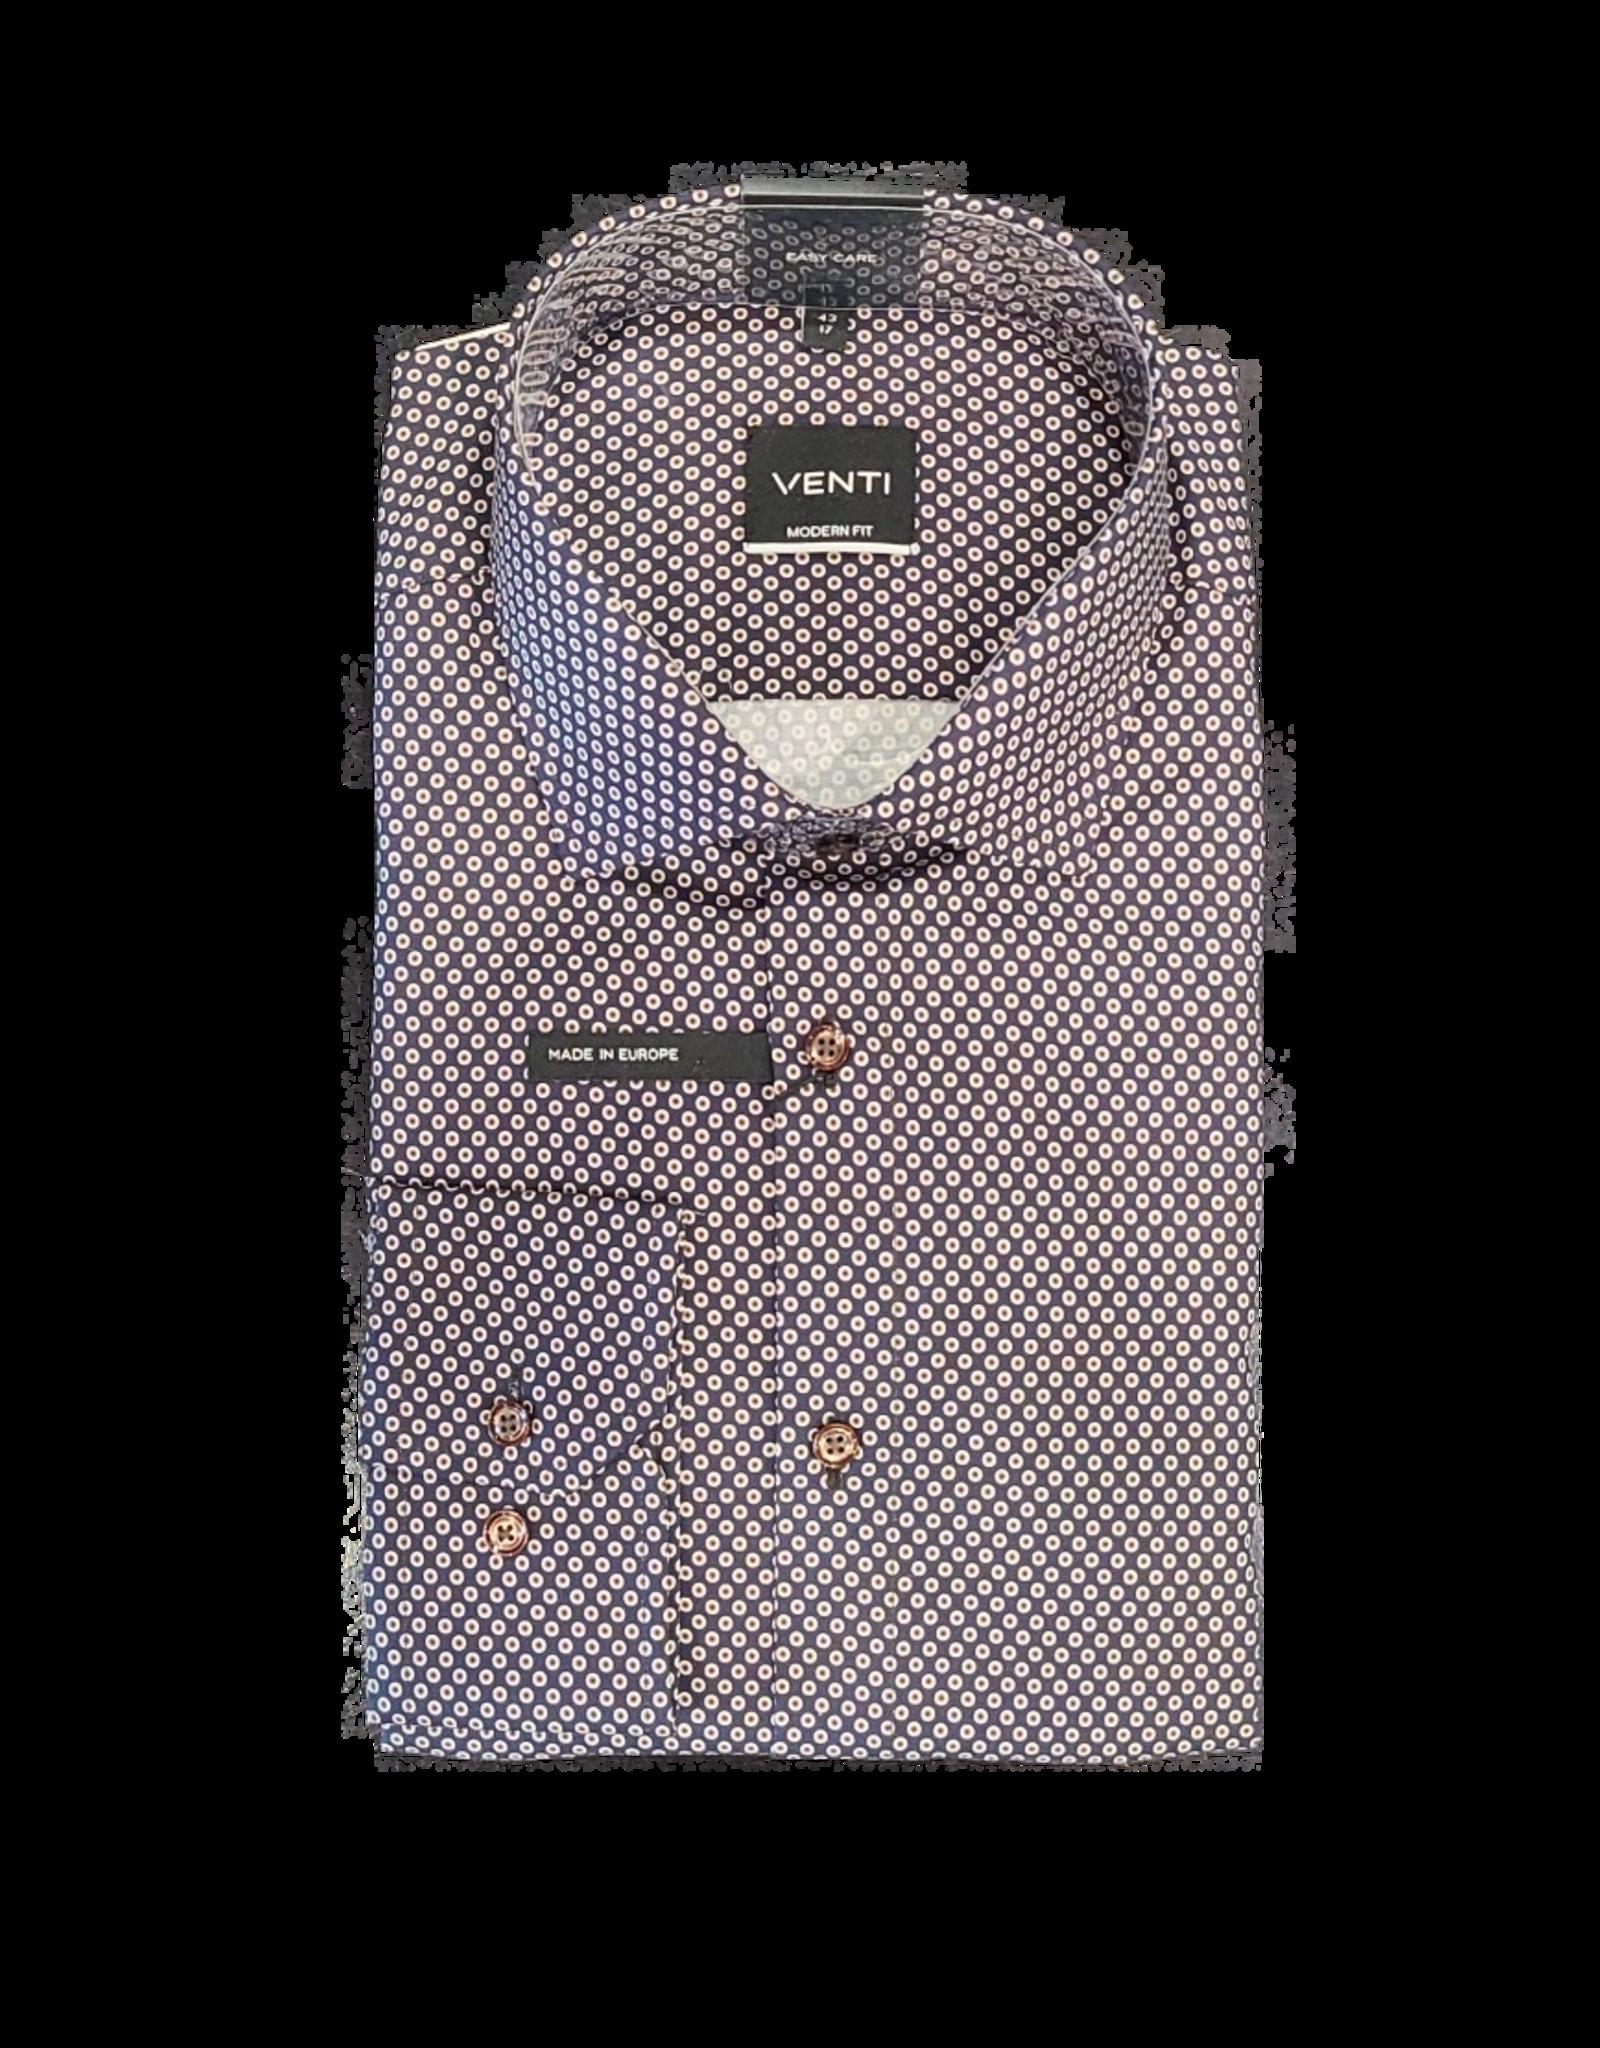 Venti 193275800 Venti Dress Shirt